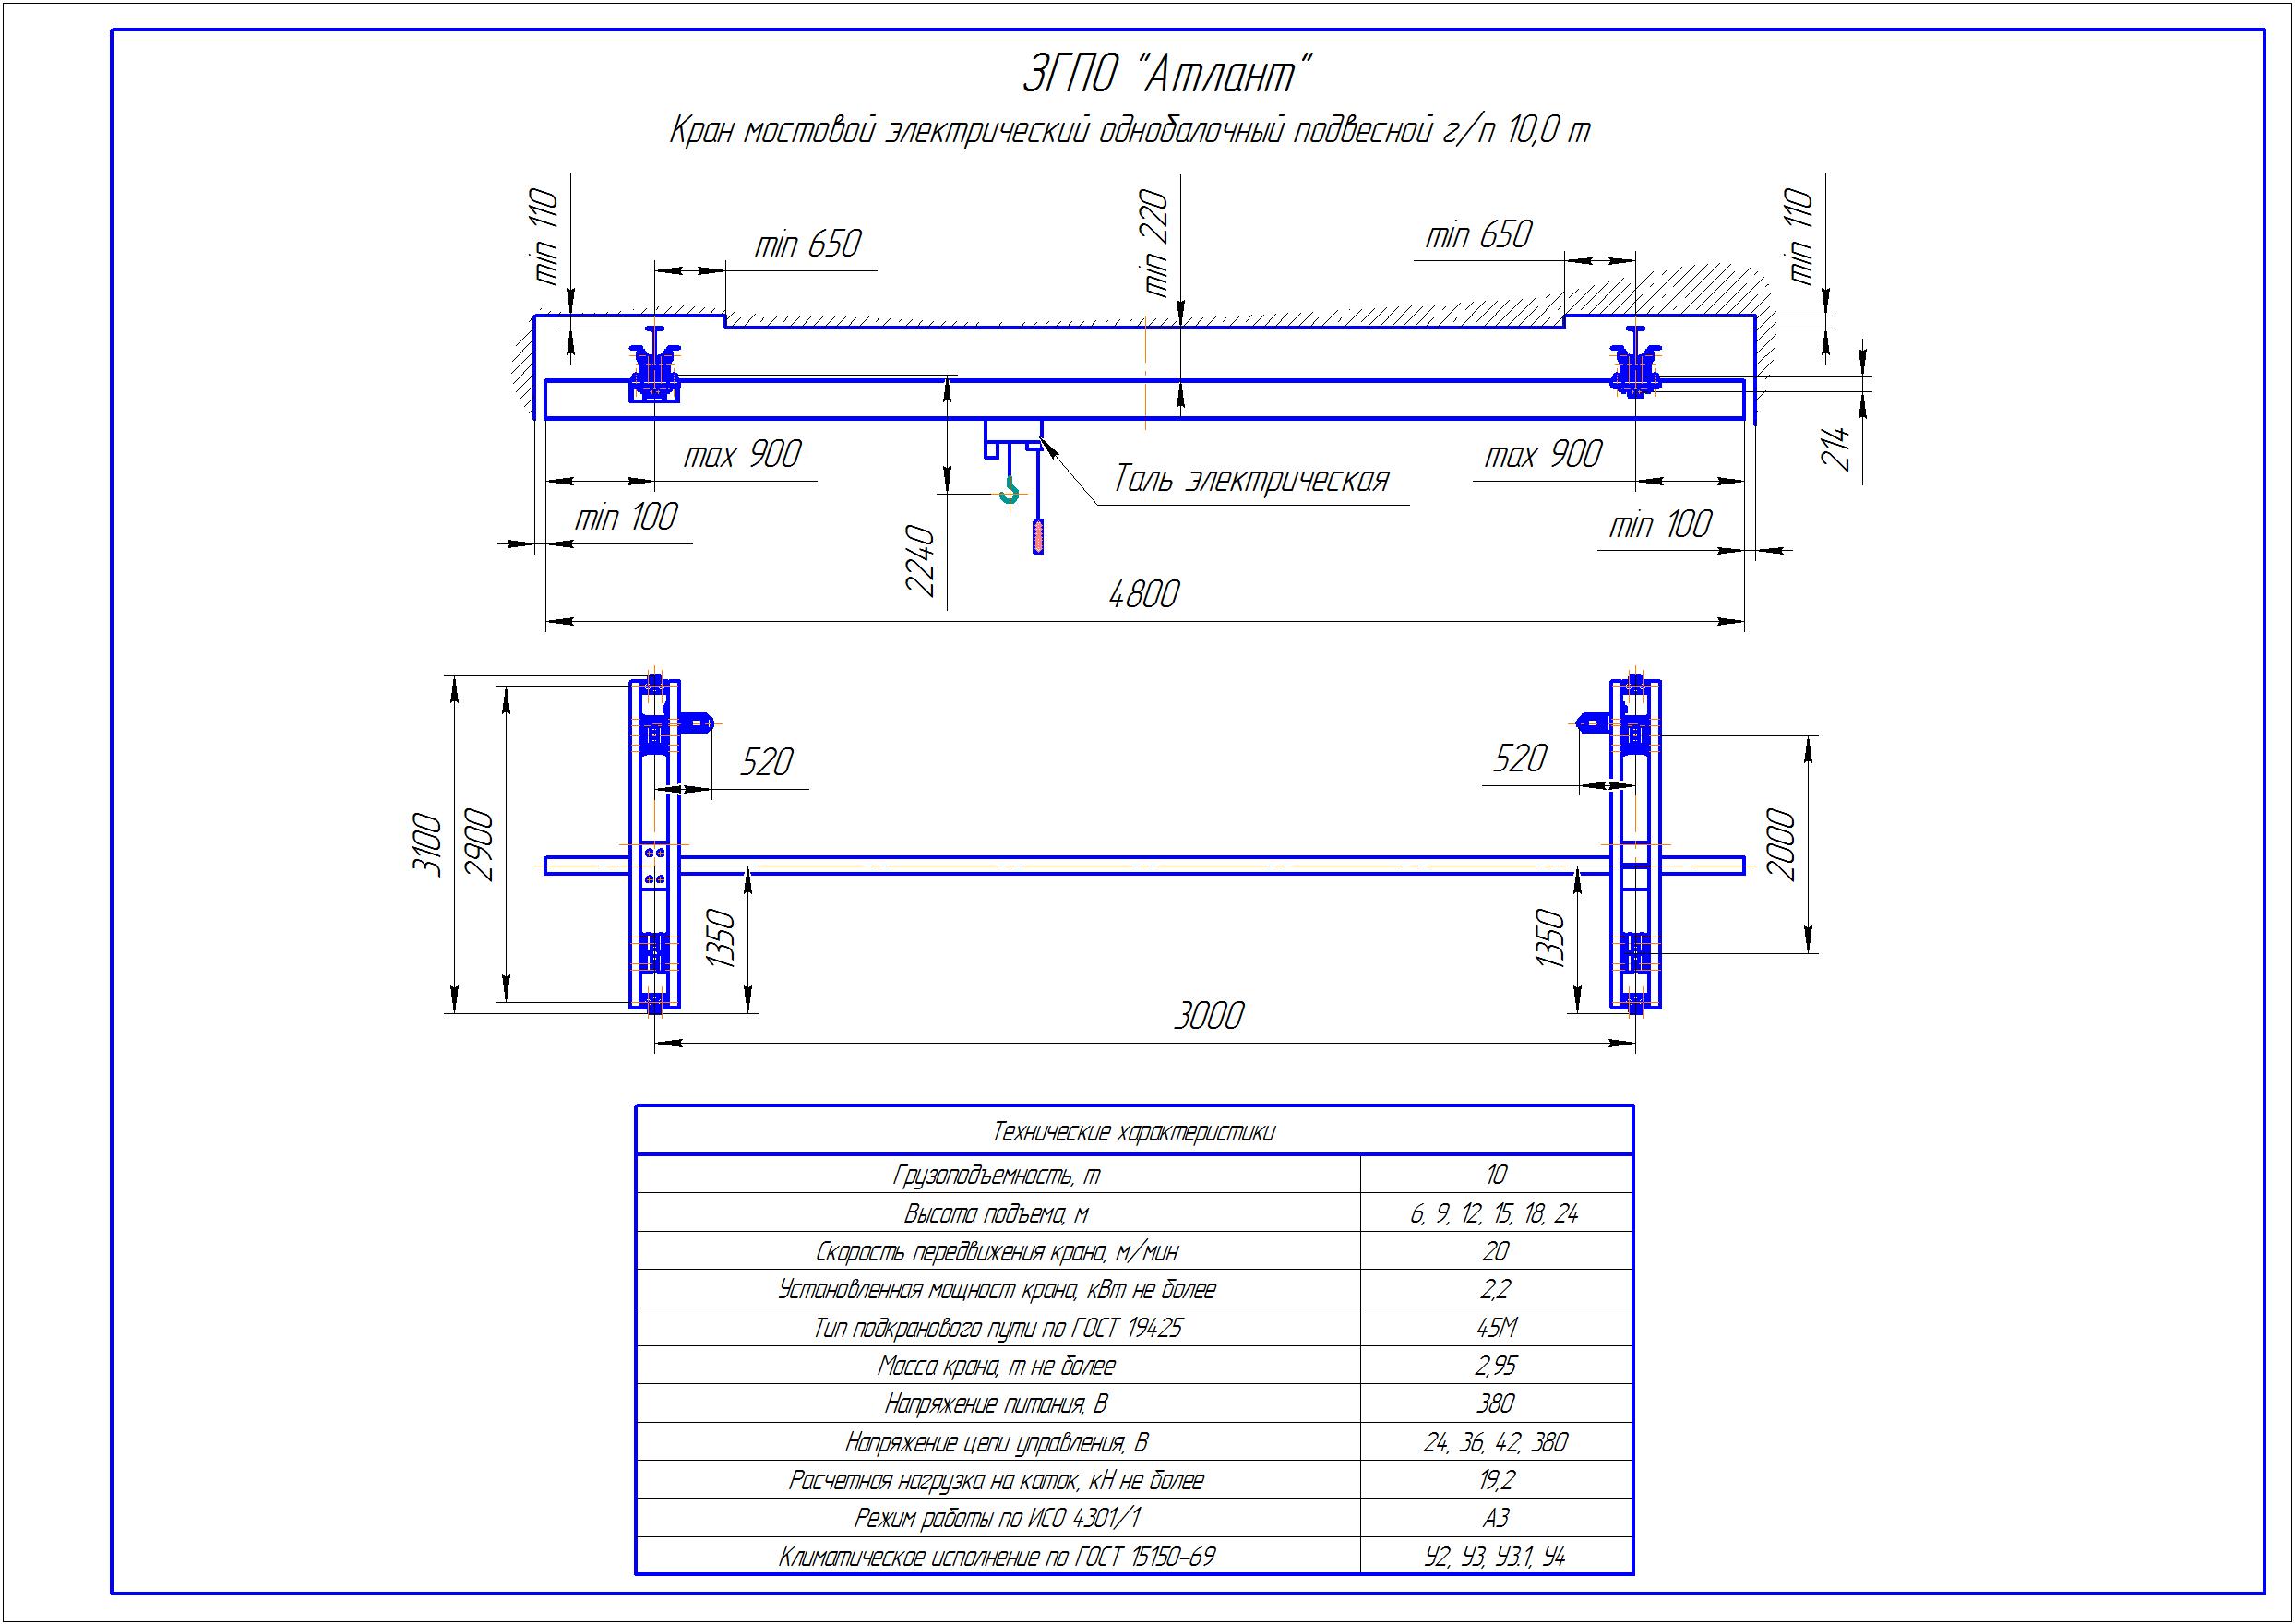 KBP 7 1 - Подвесная кран балка